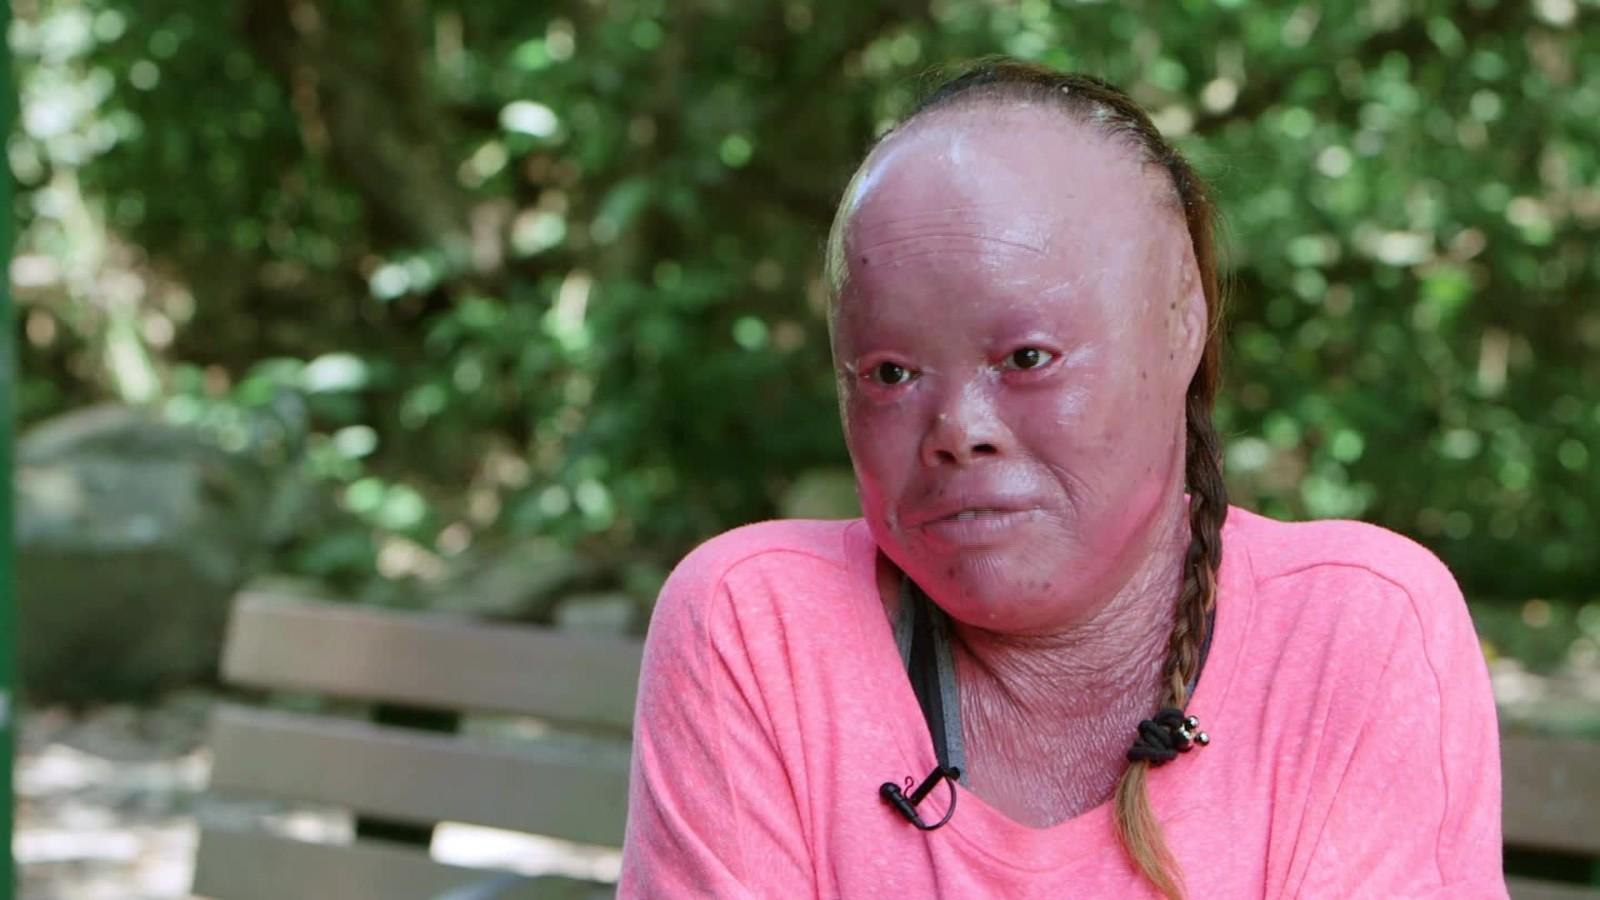 Mui thomas uses rare skin condition to inspire cnn video publicscrutiny Choice Image